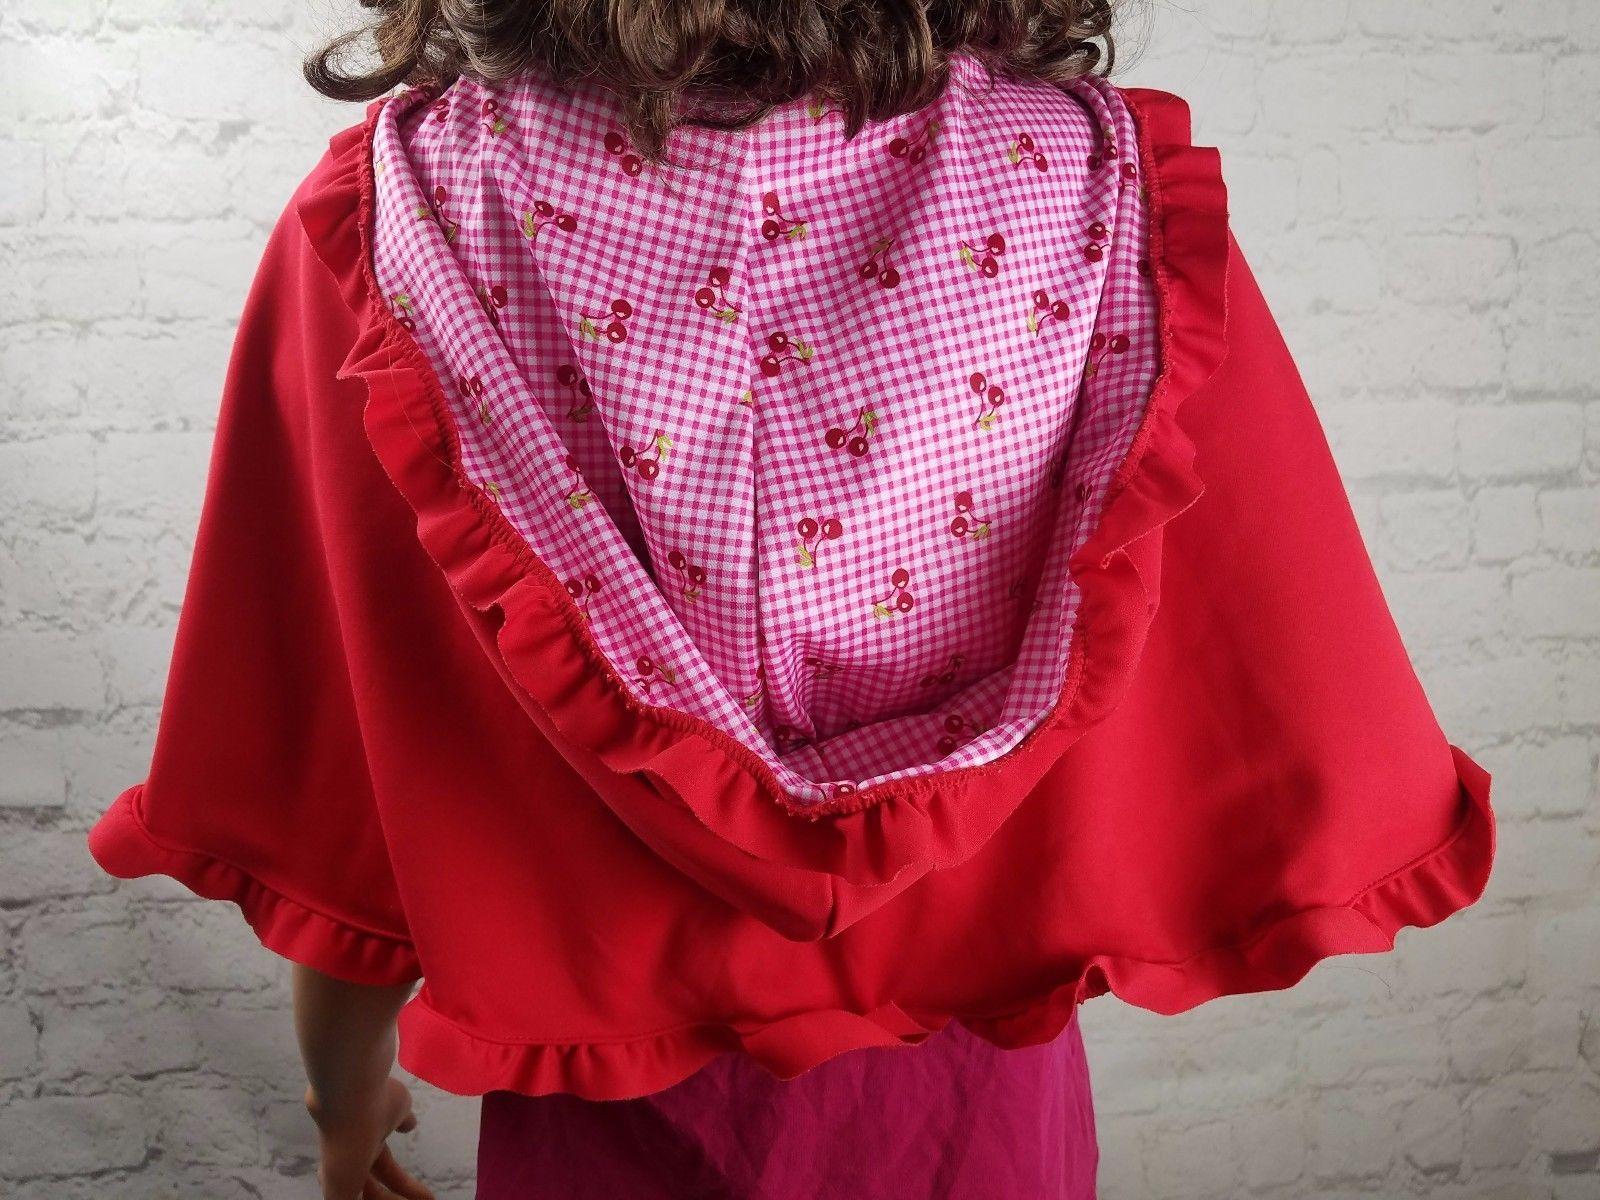 Girls Red Riding Hood Cape Costume CUTE! Handmade Checkered Cherry